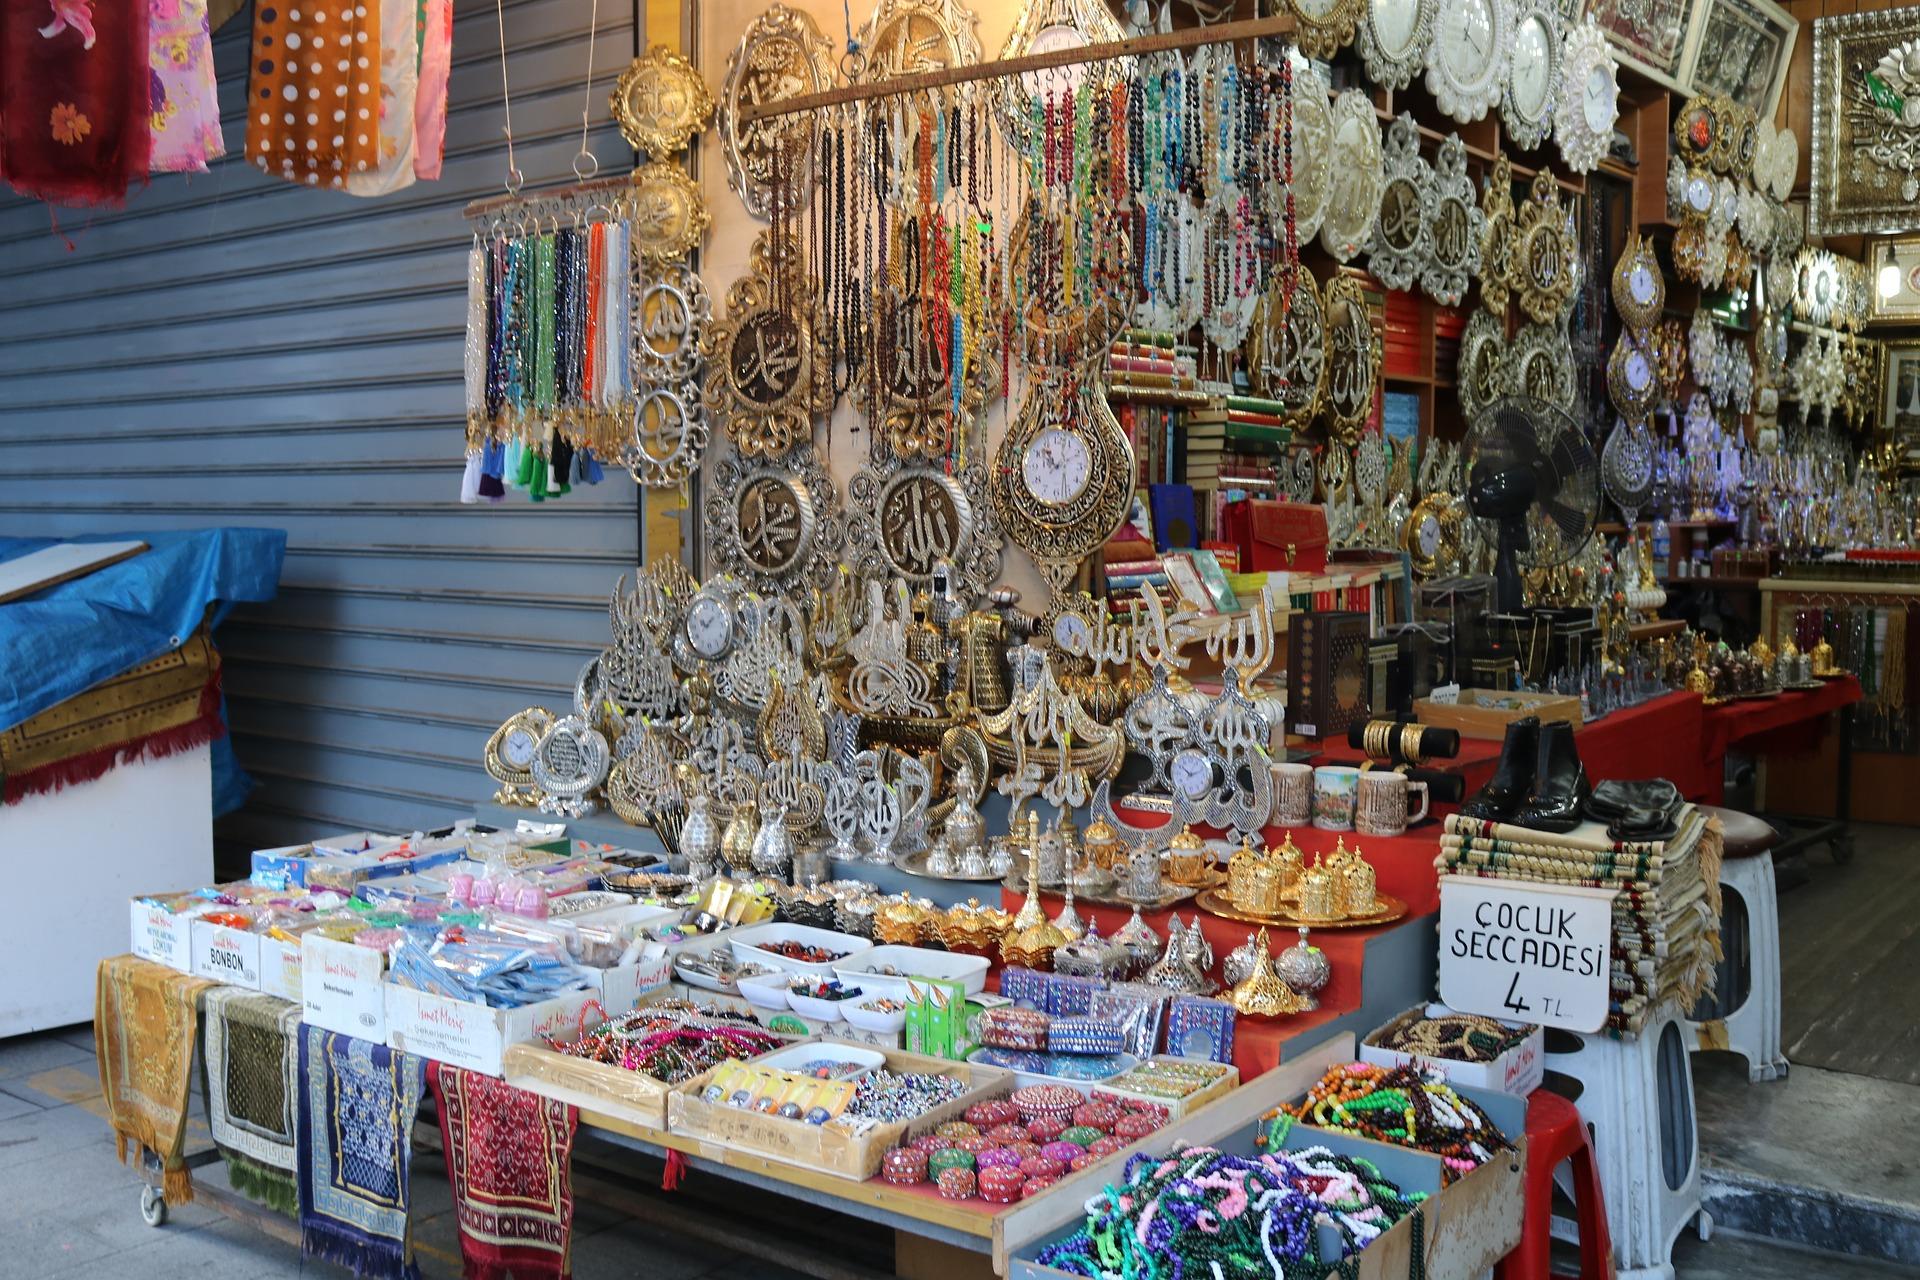 15 populære souvenirs fra Tyrkiet